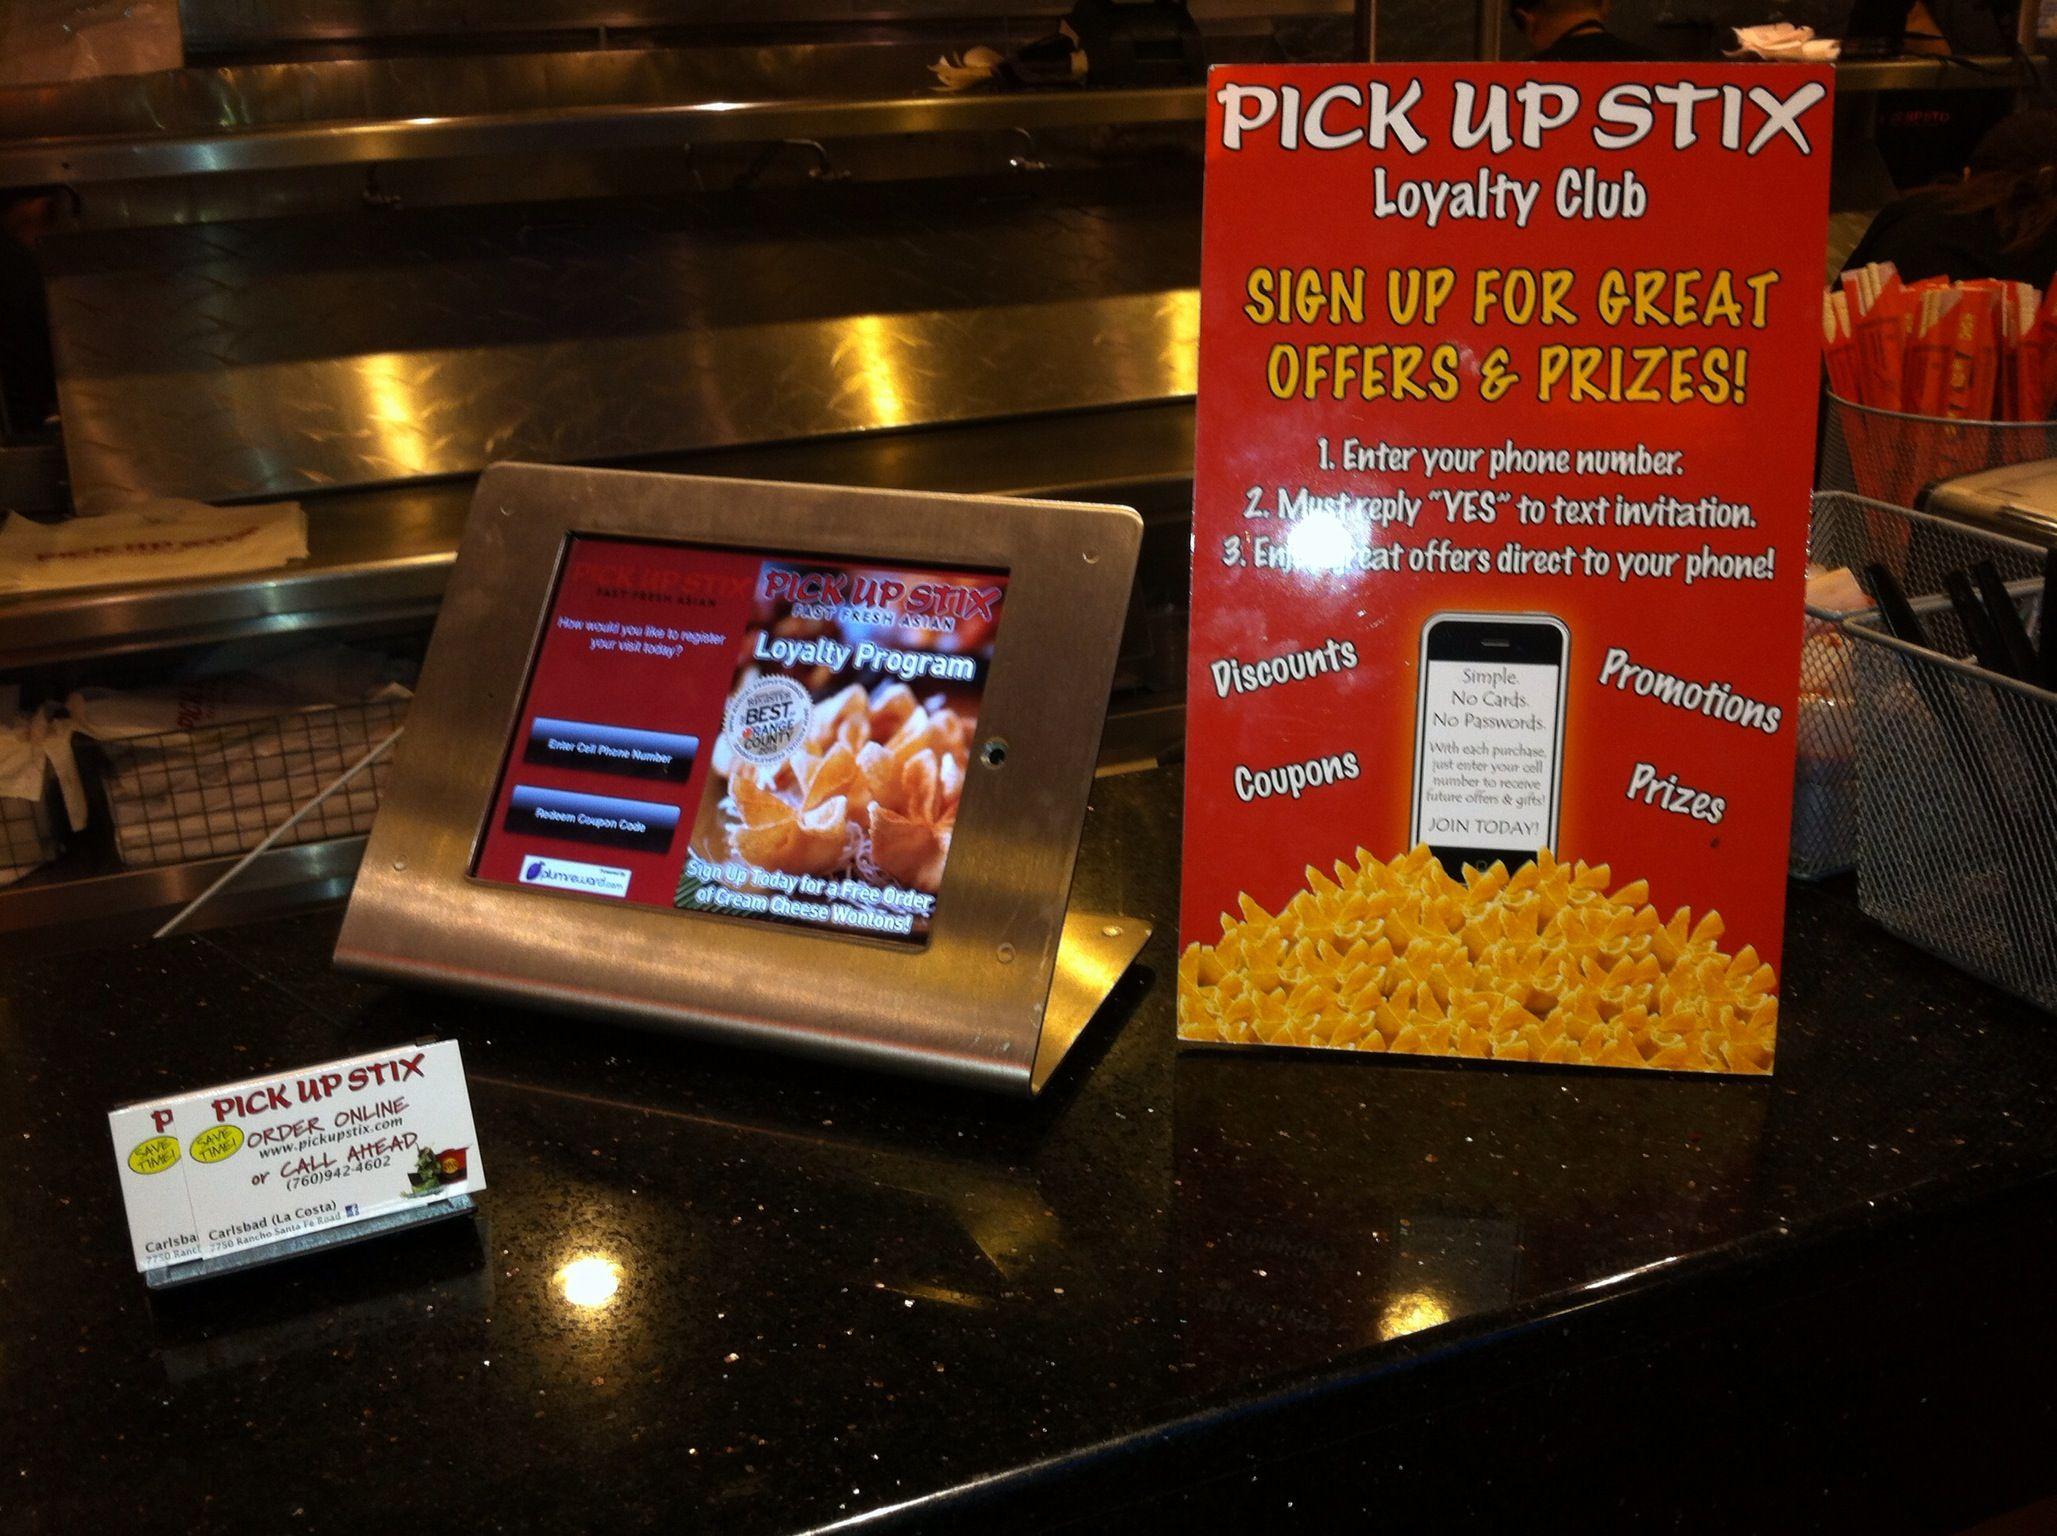 Counter card promoting loyalty program Pick Up Stix